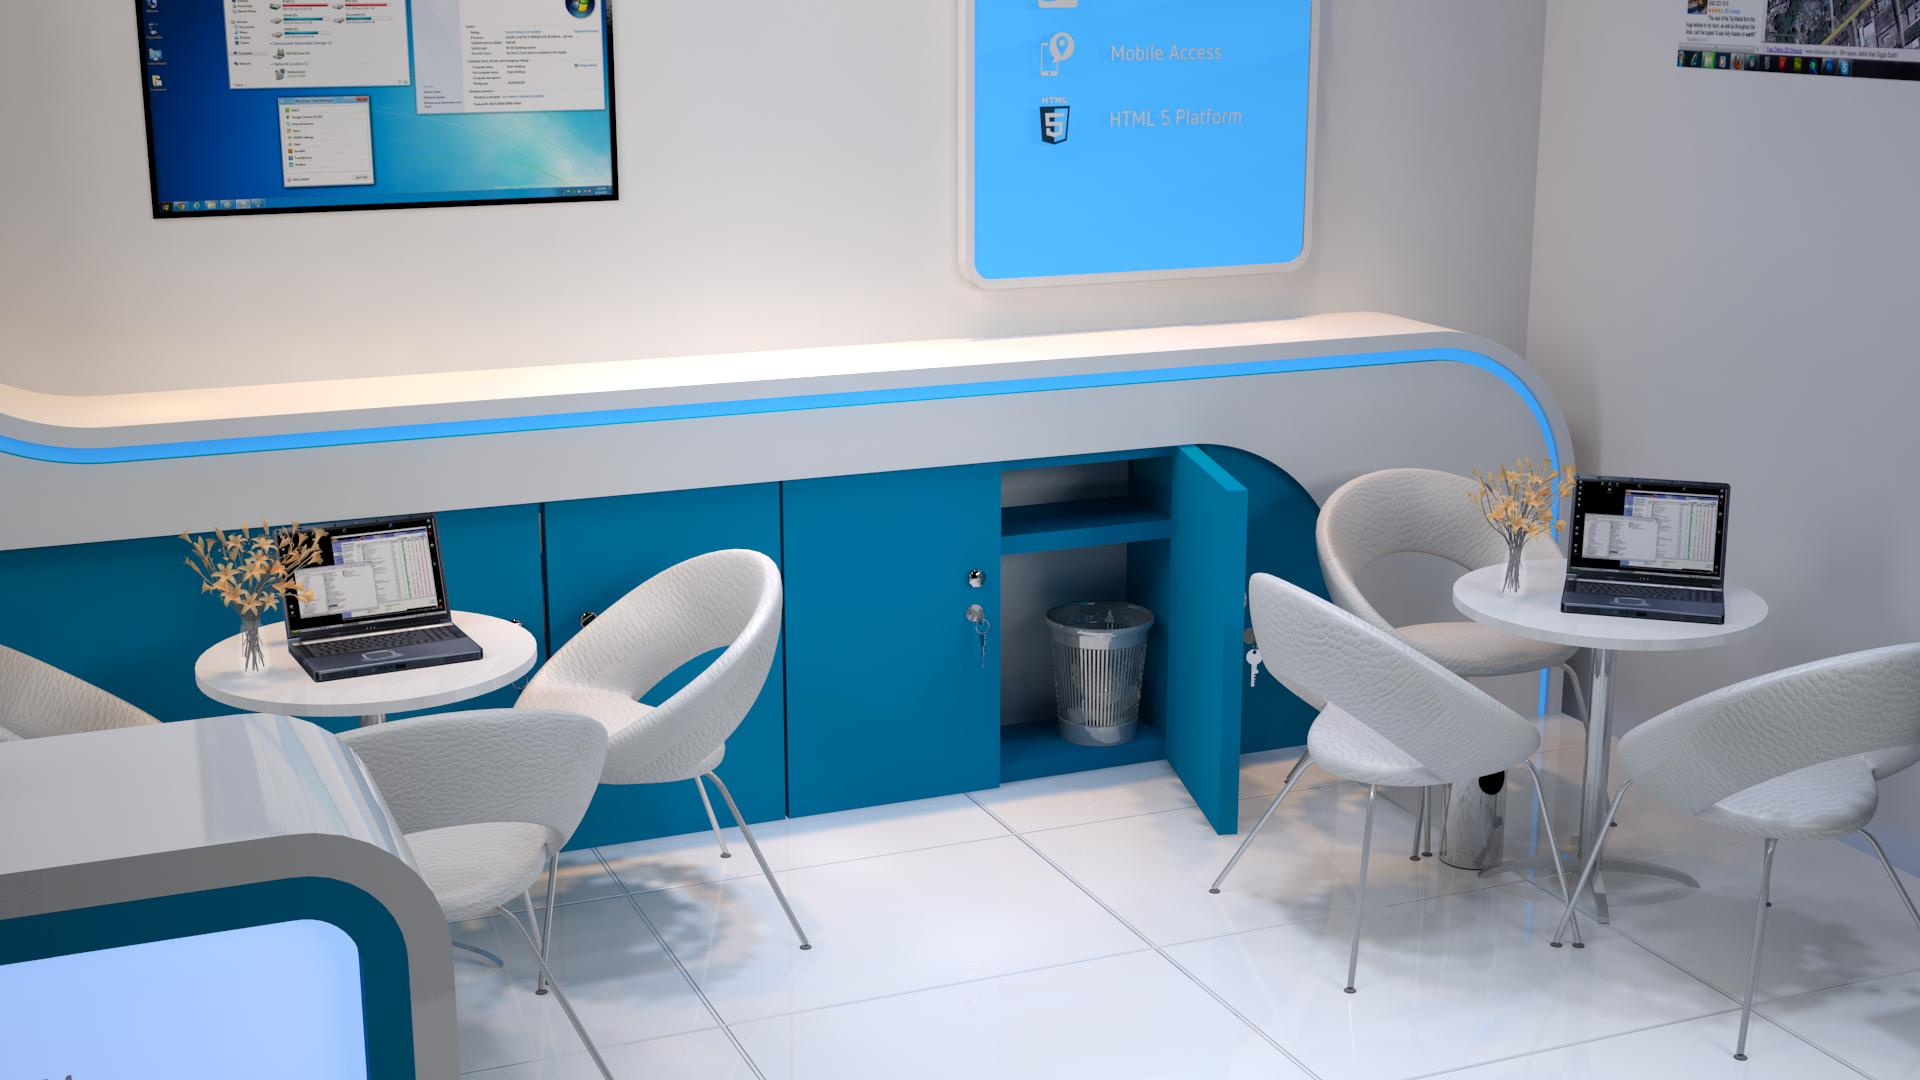 3d Exhibition Stall Design : D exhibition stall design by manindar on deviantart